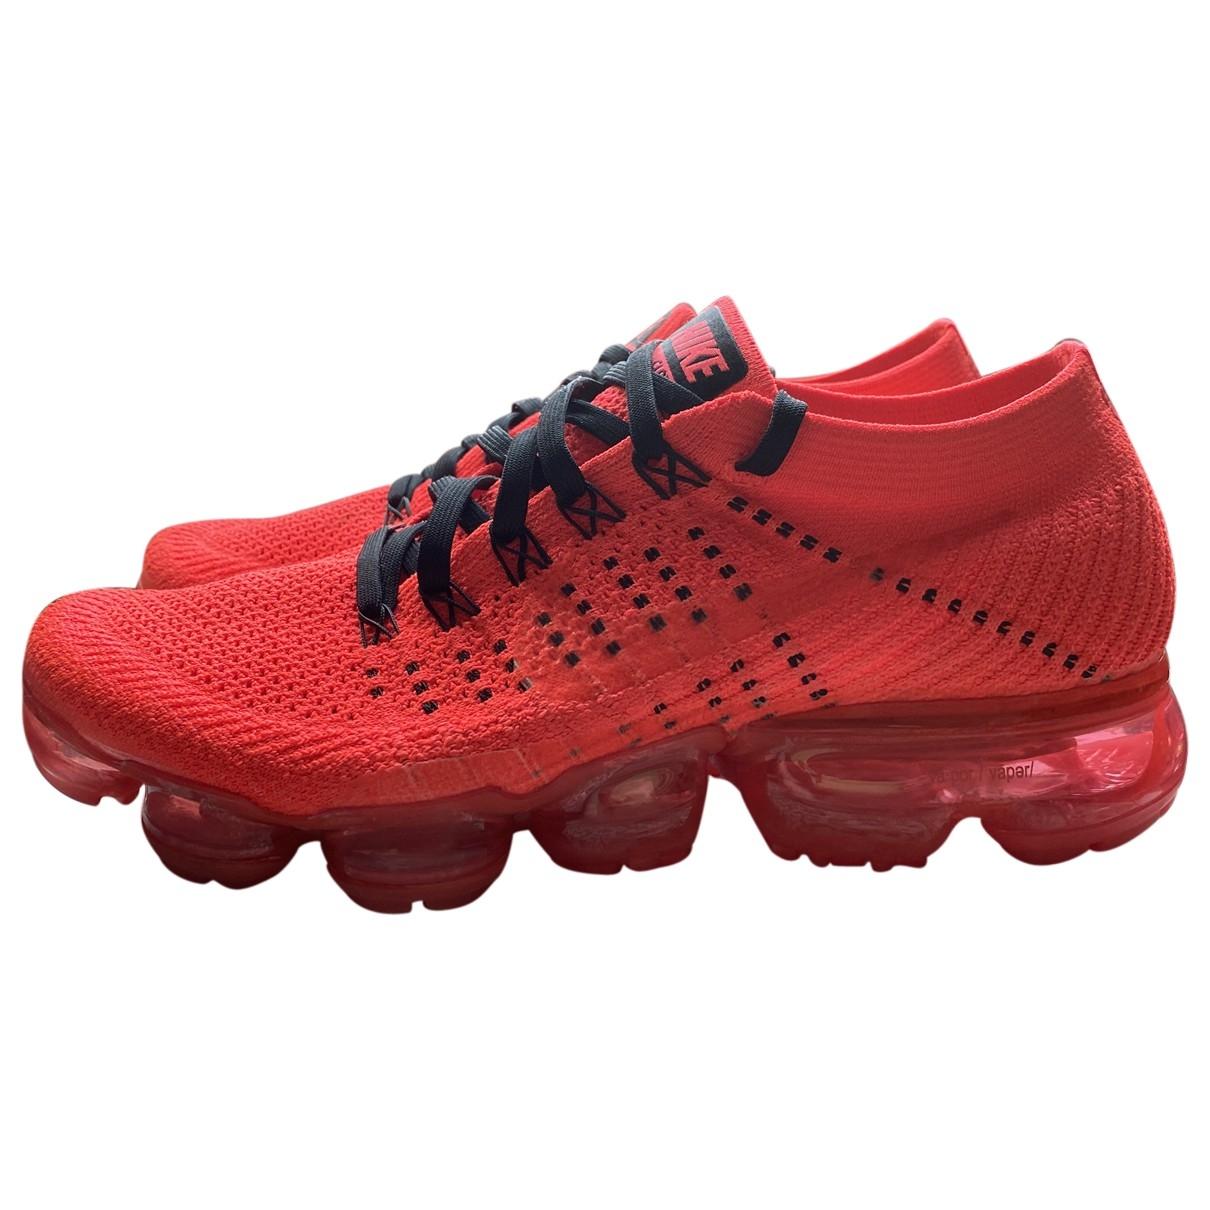 Nike Air VaporMax Red Cloth Trainers for Women 39 EU